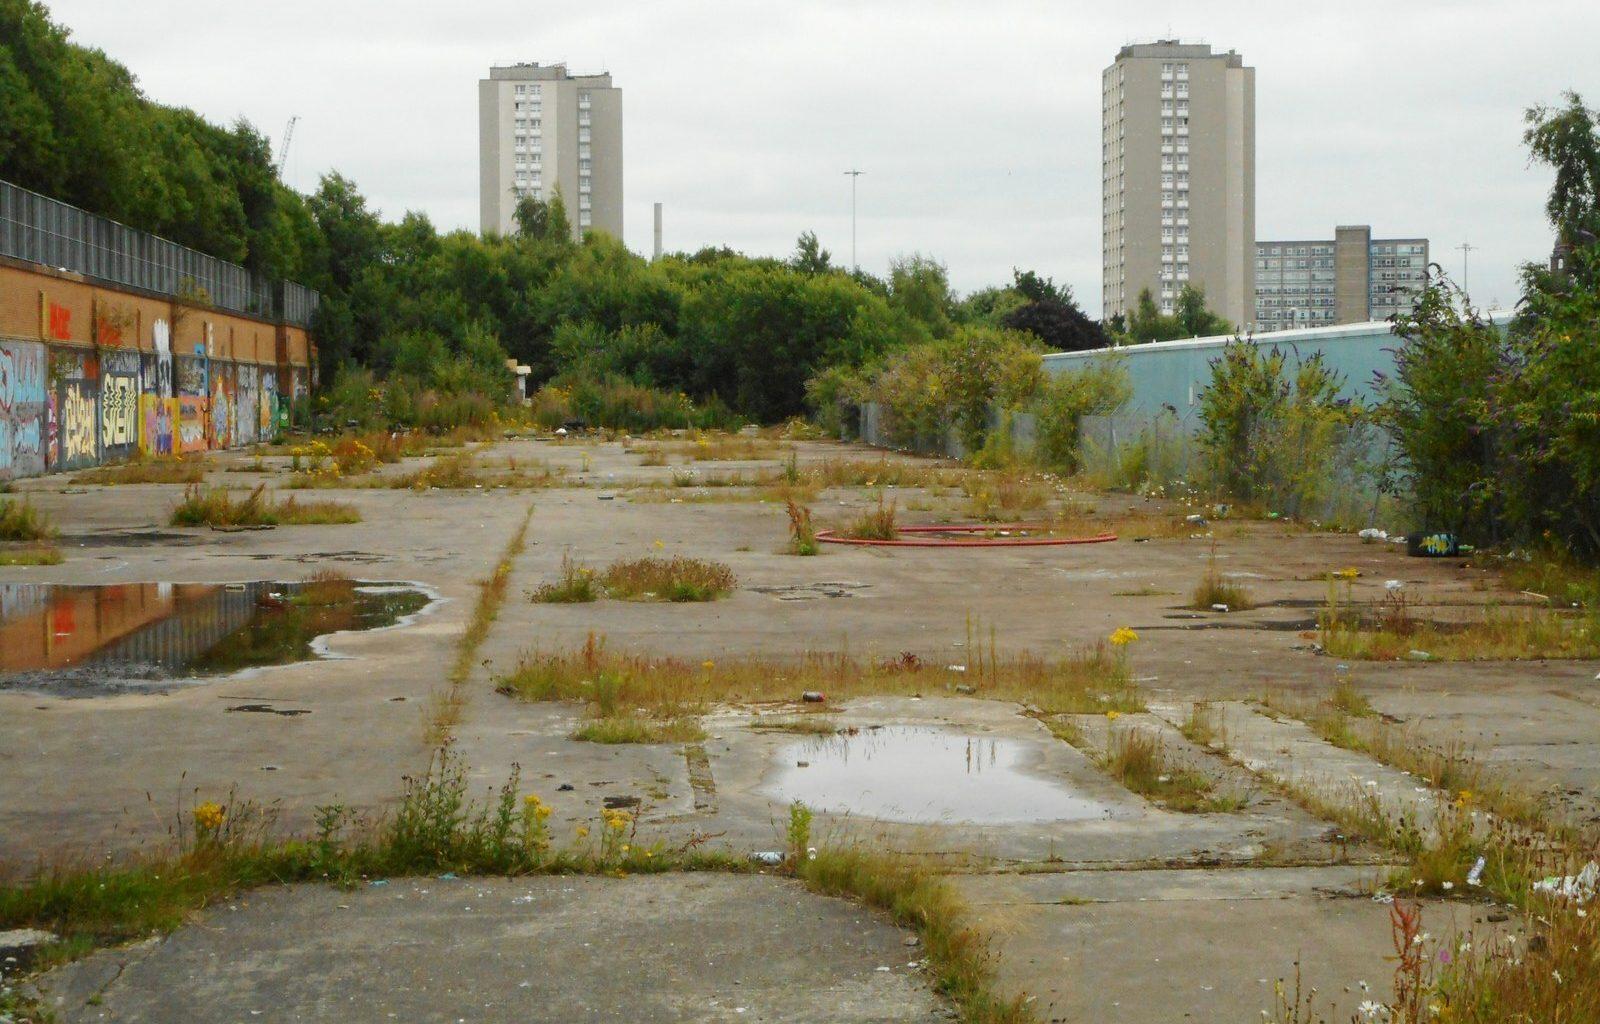 Scotland losing 'substantial revenue' over derelict land 8